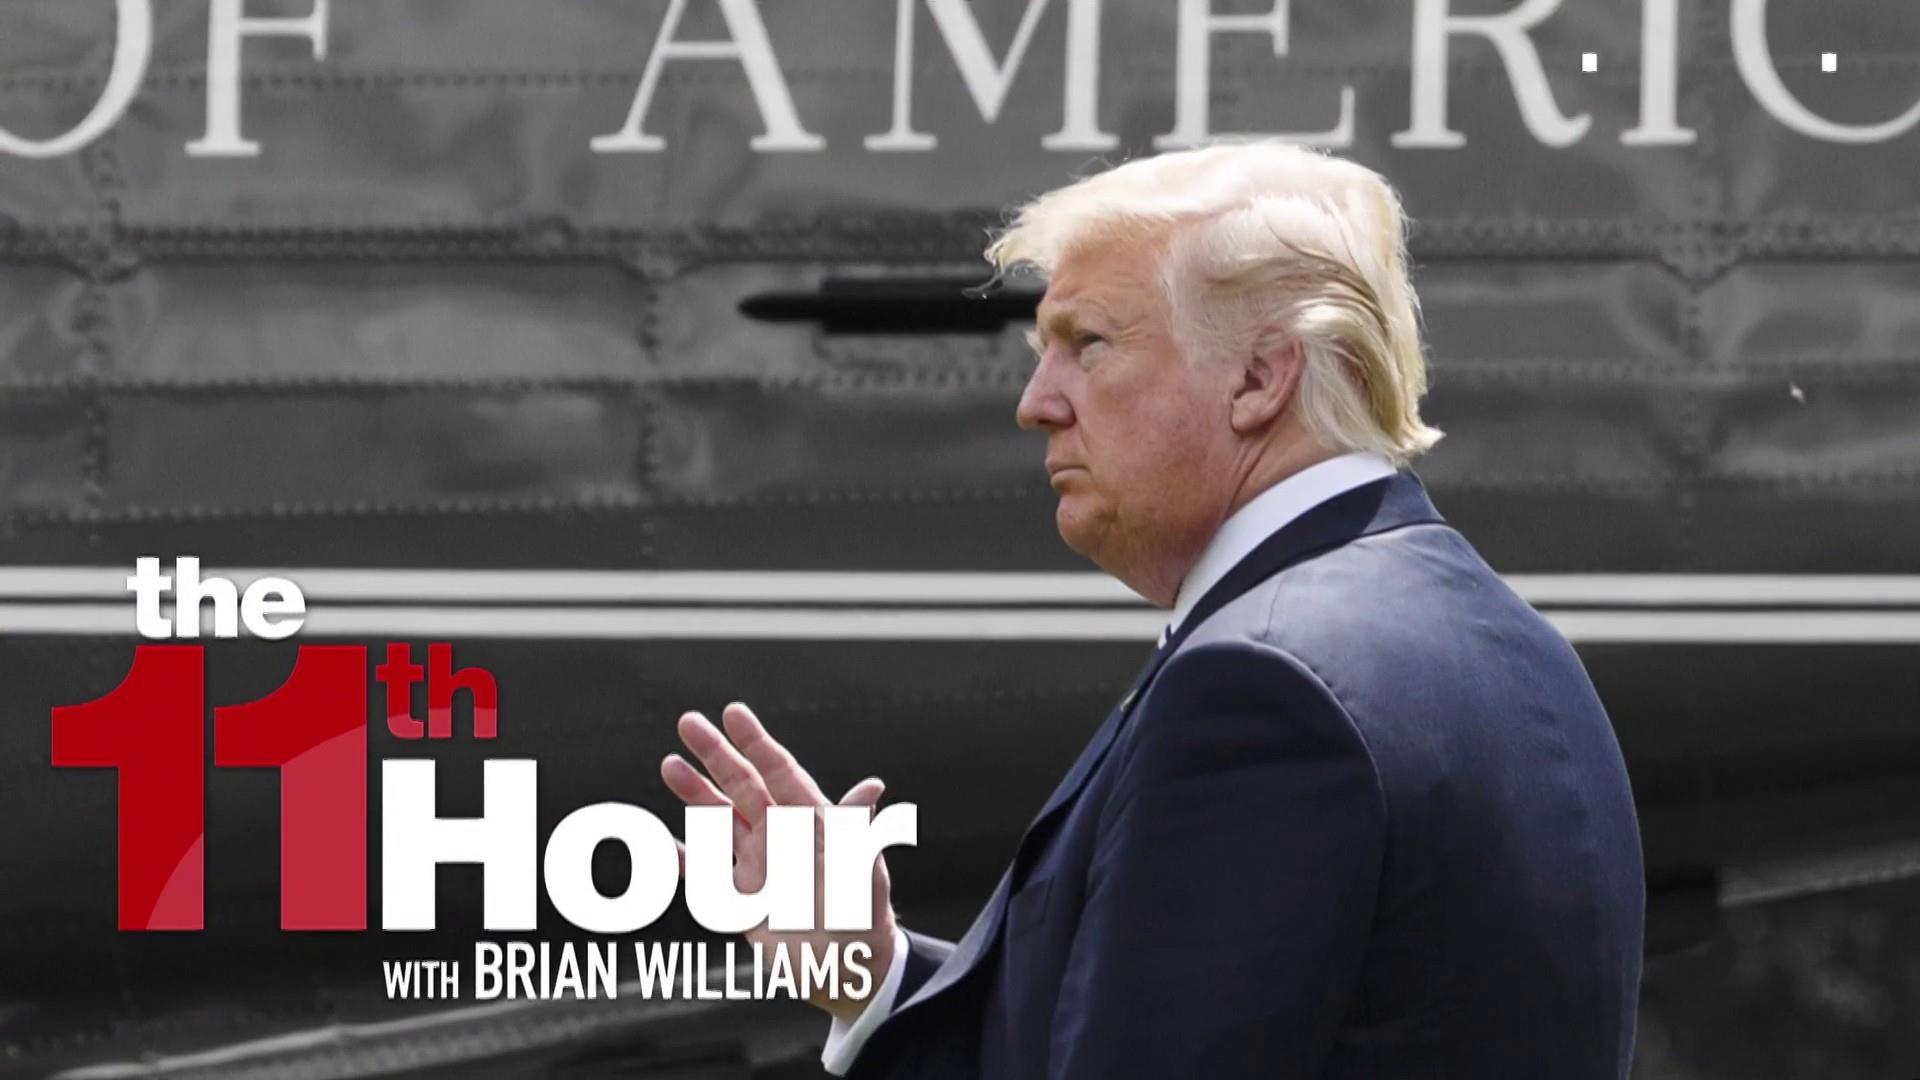 John Brennan: Woodward's book shows Trump is a danger to U.S.